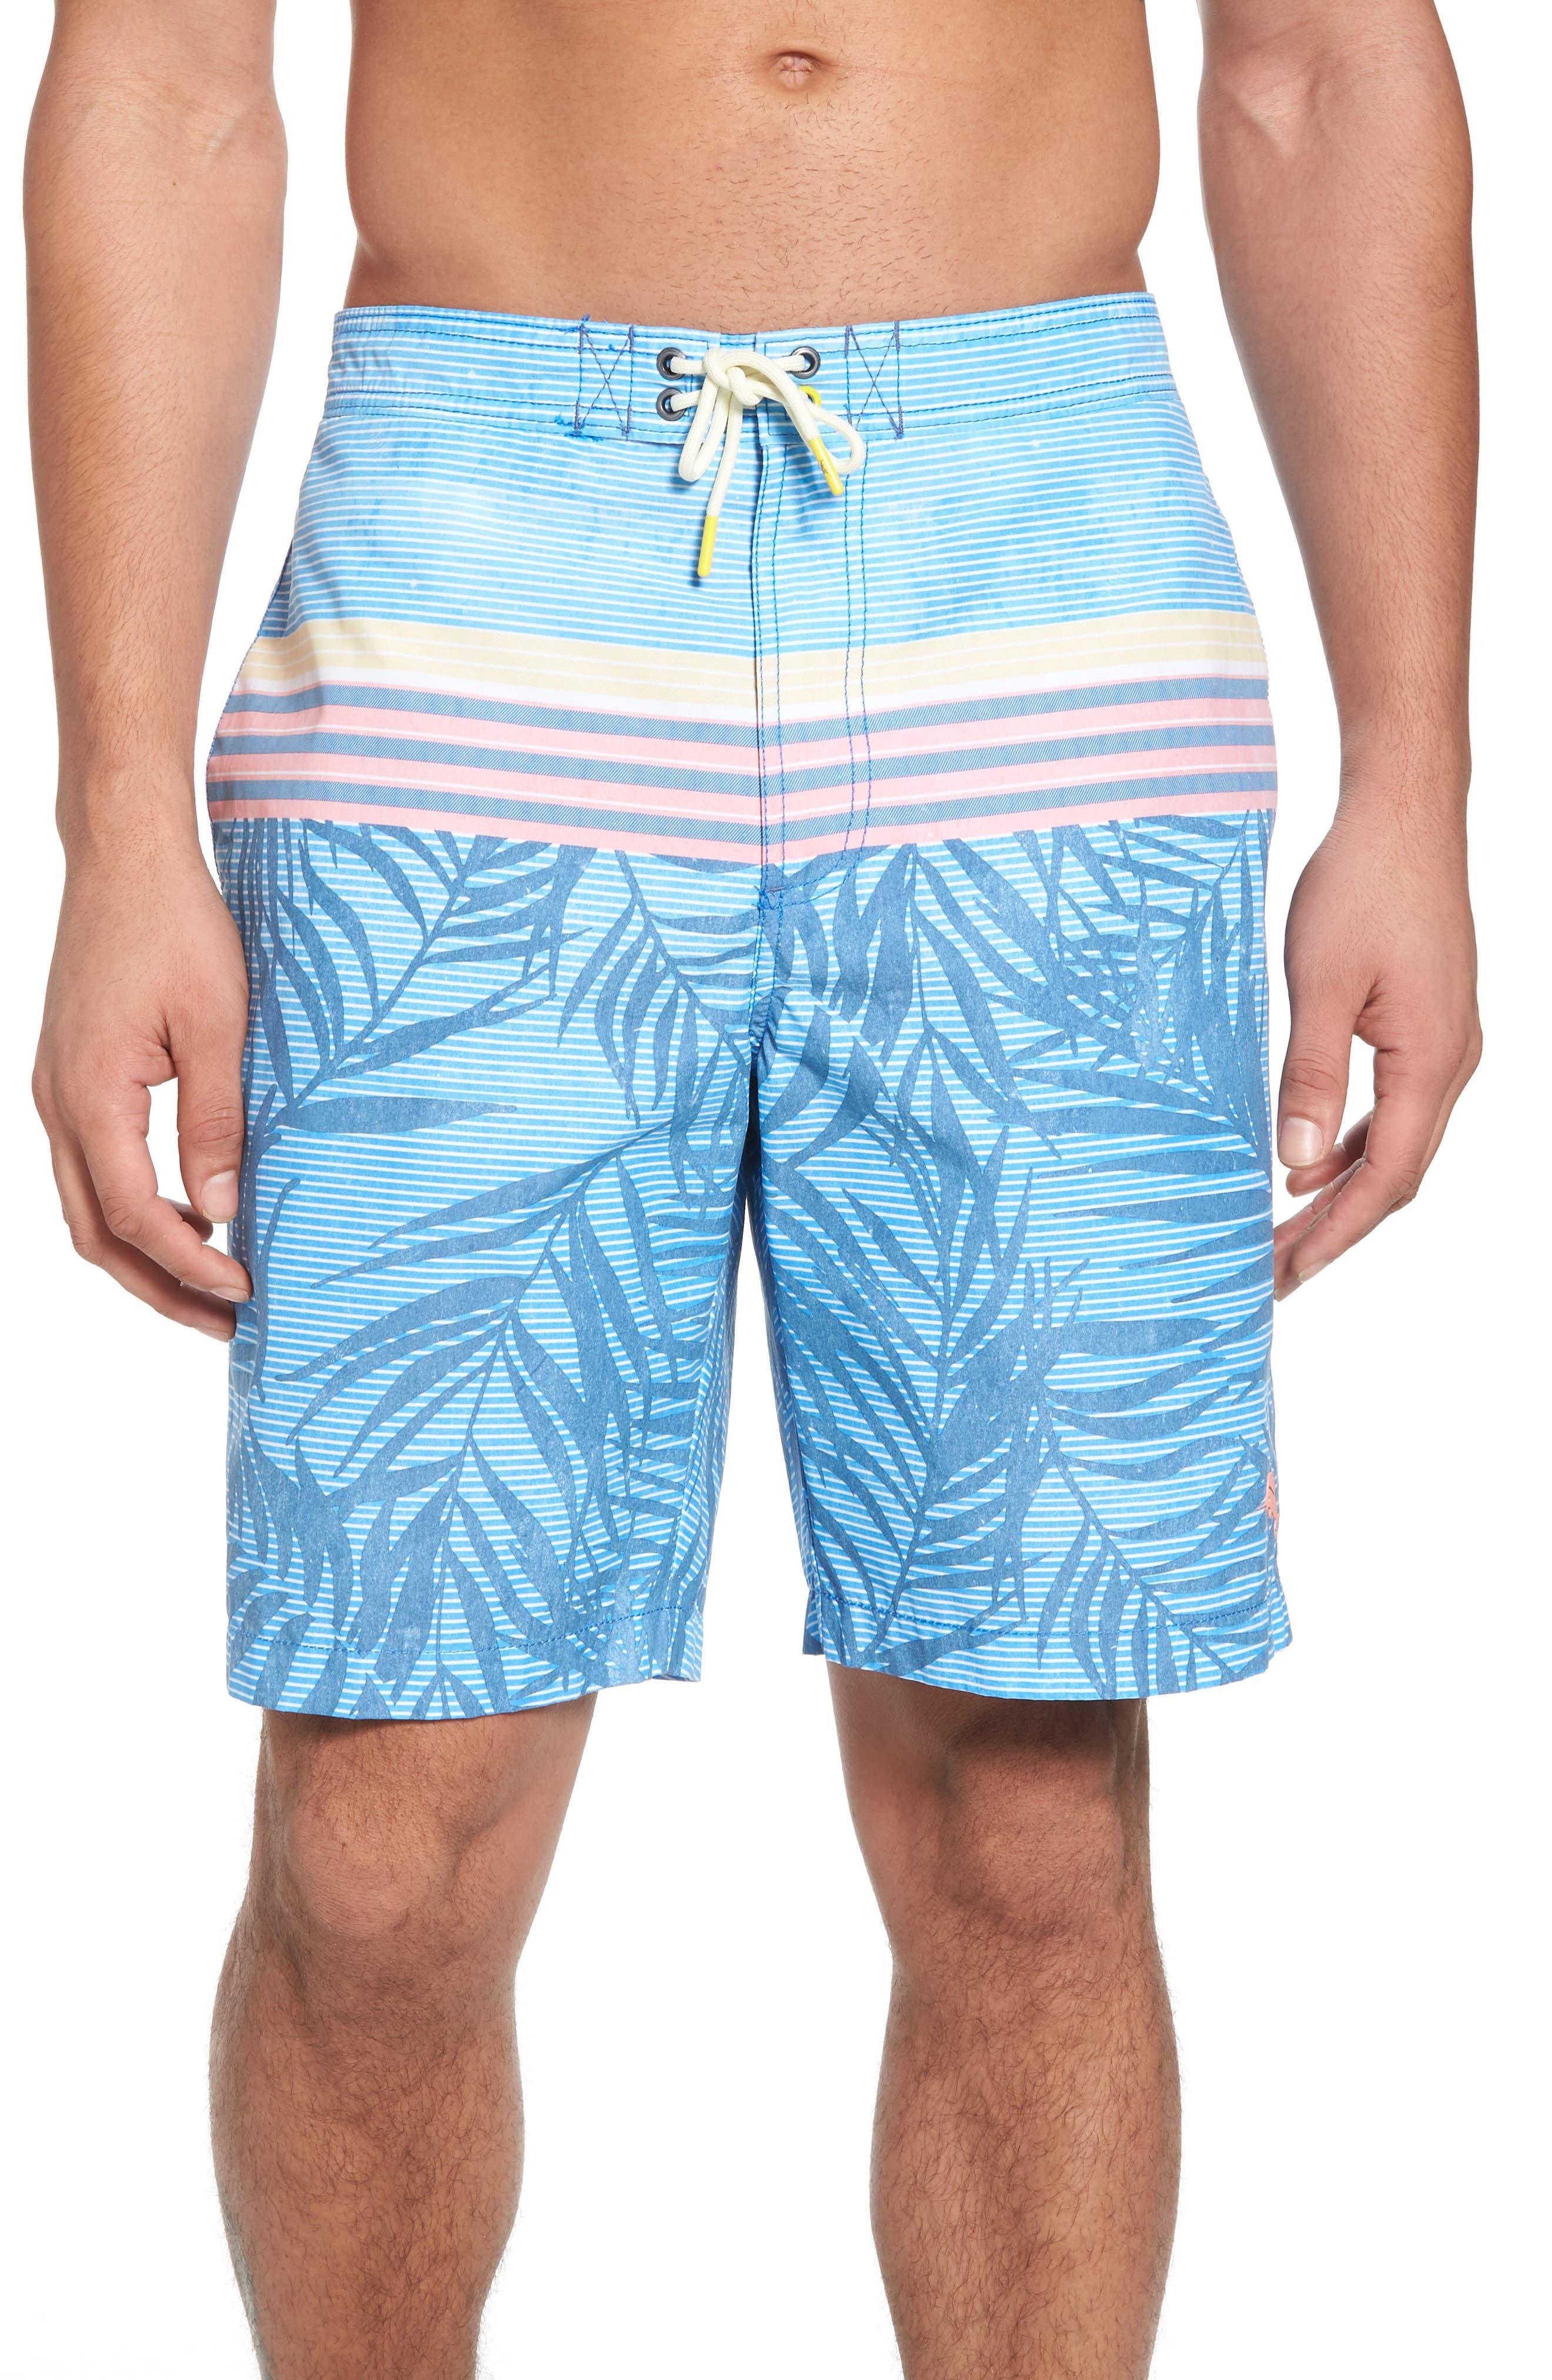 TOMMY BAHAMA Baja Fronds & Stripes Board Shorts, Main, color, 400